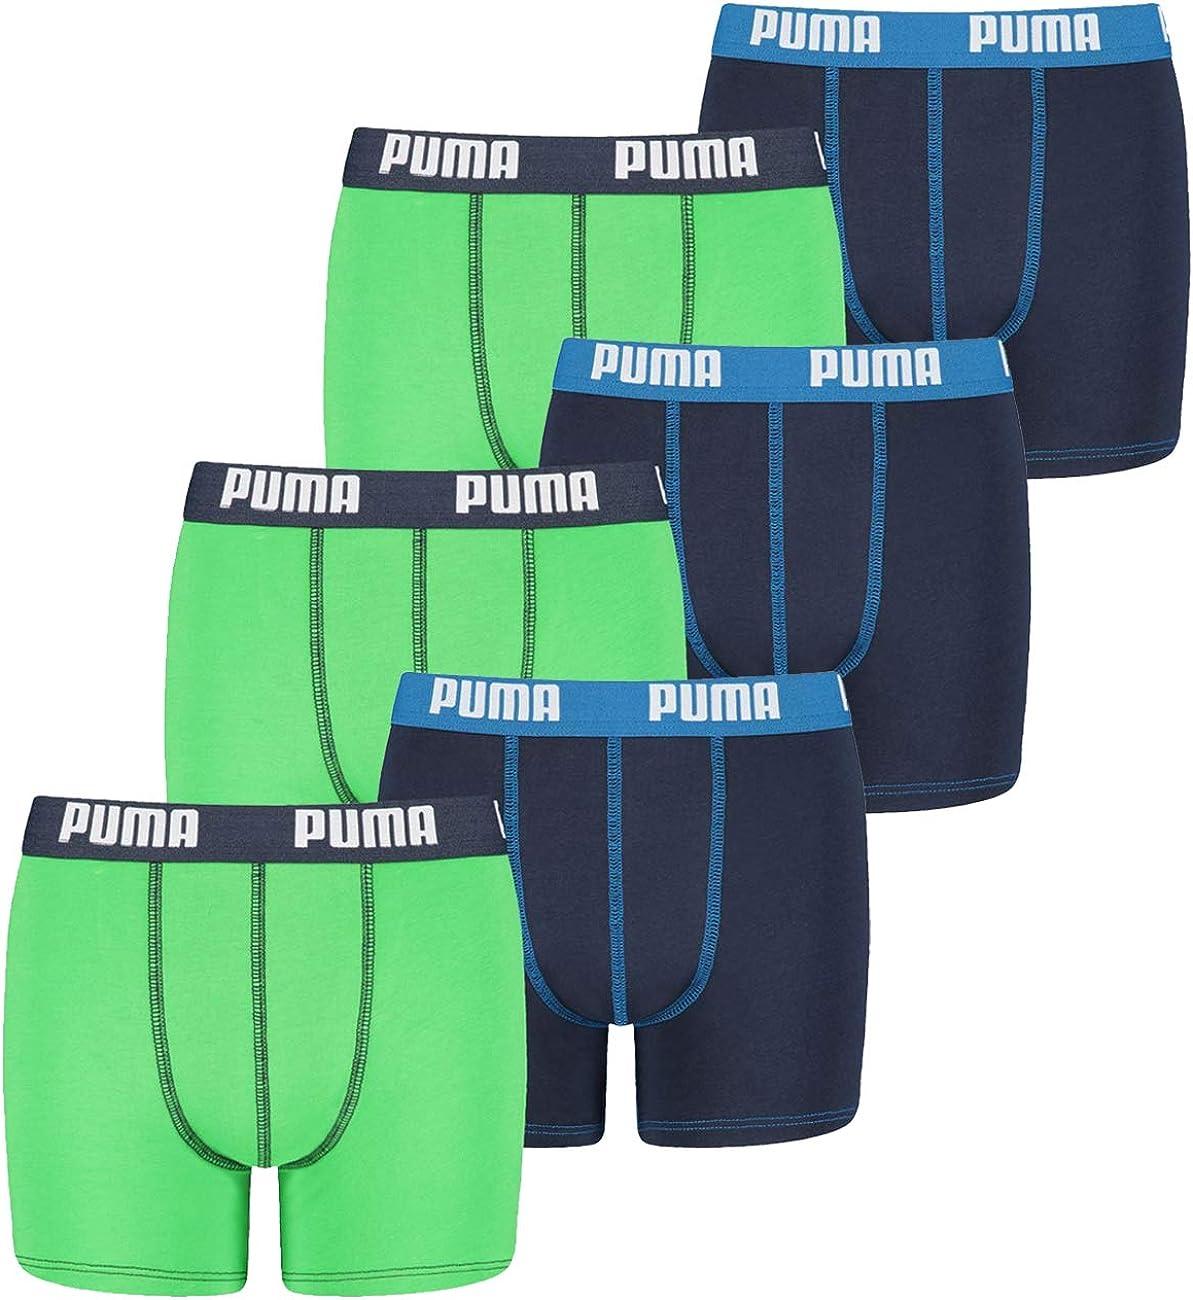 Puma Basic - Caleçon - Uni - Lot de 2 - Garçon